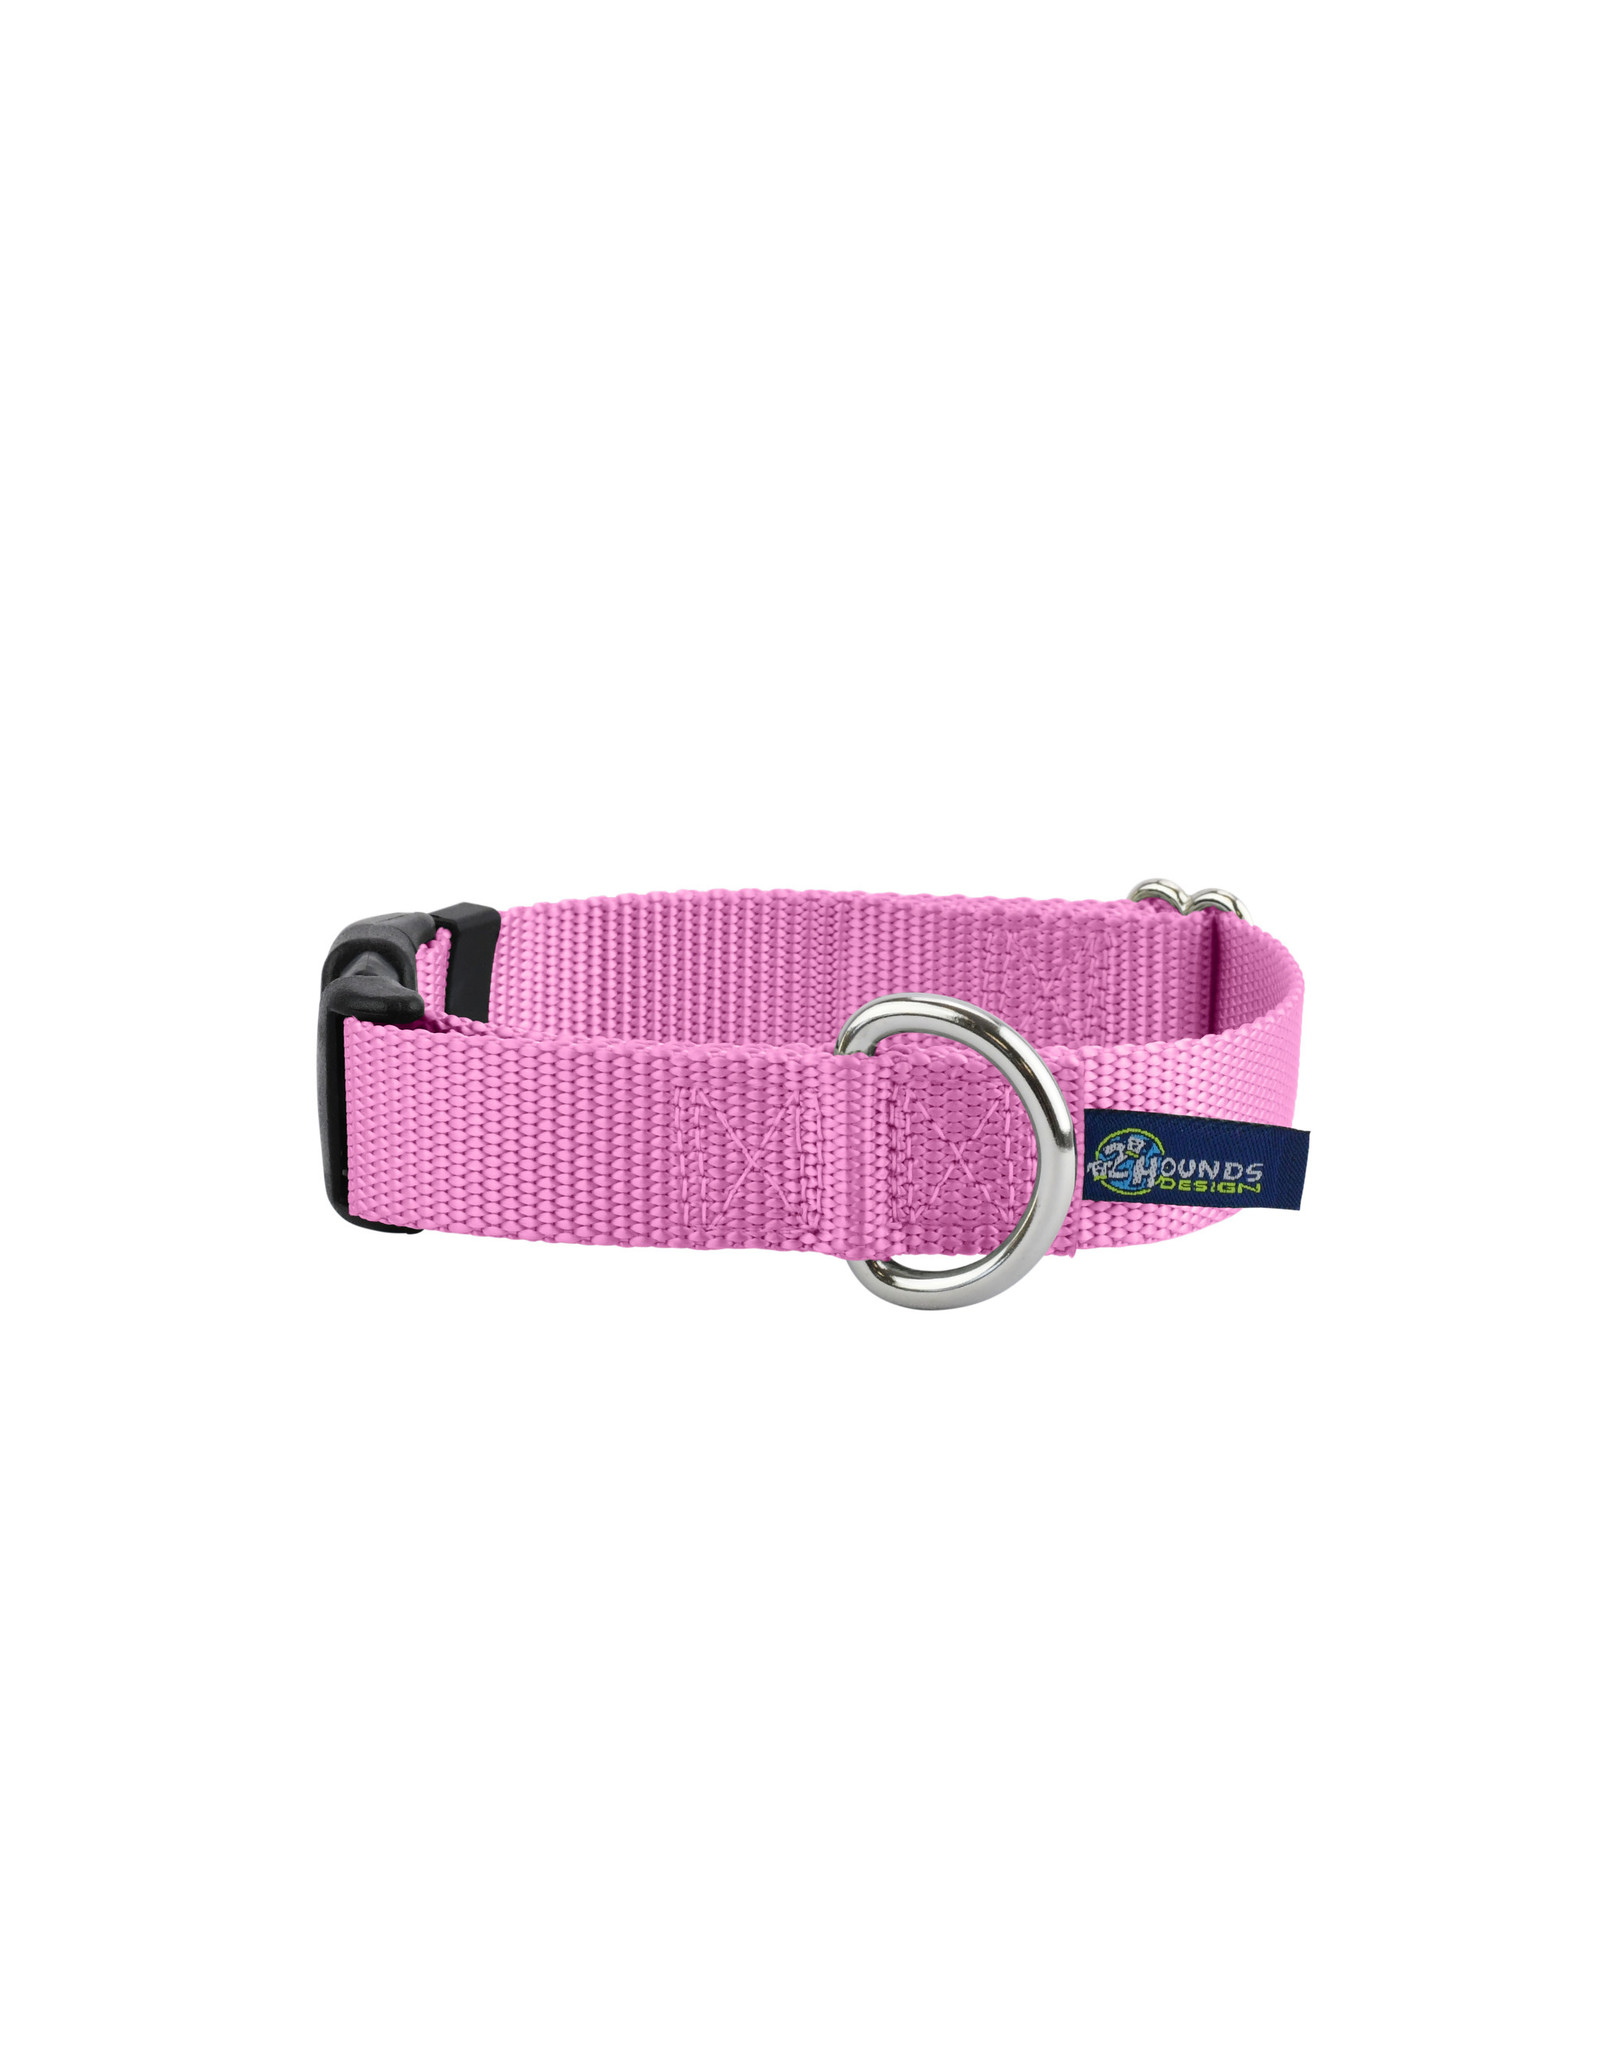 "2 Hounds Design Buckle Collar: Rose Pink, 5/8"" S"